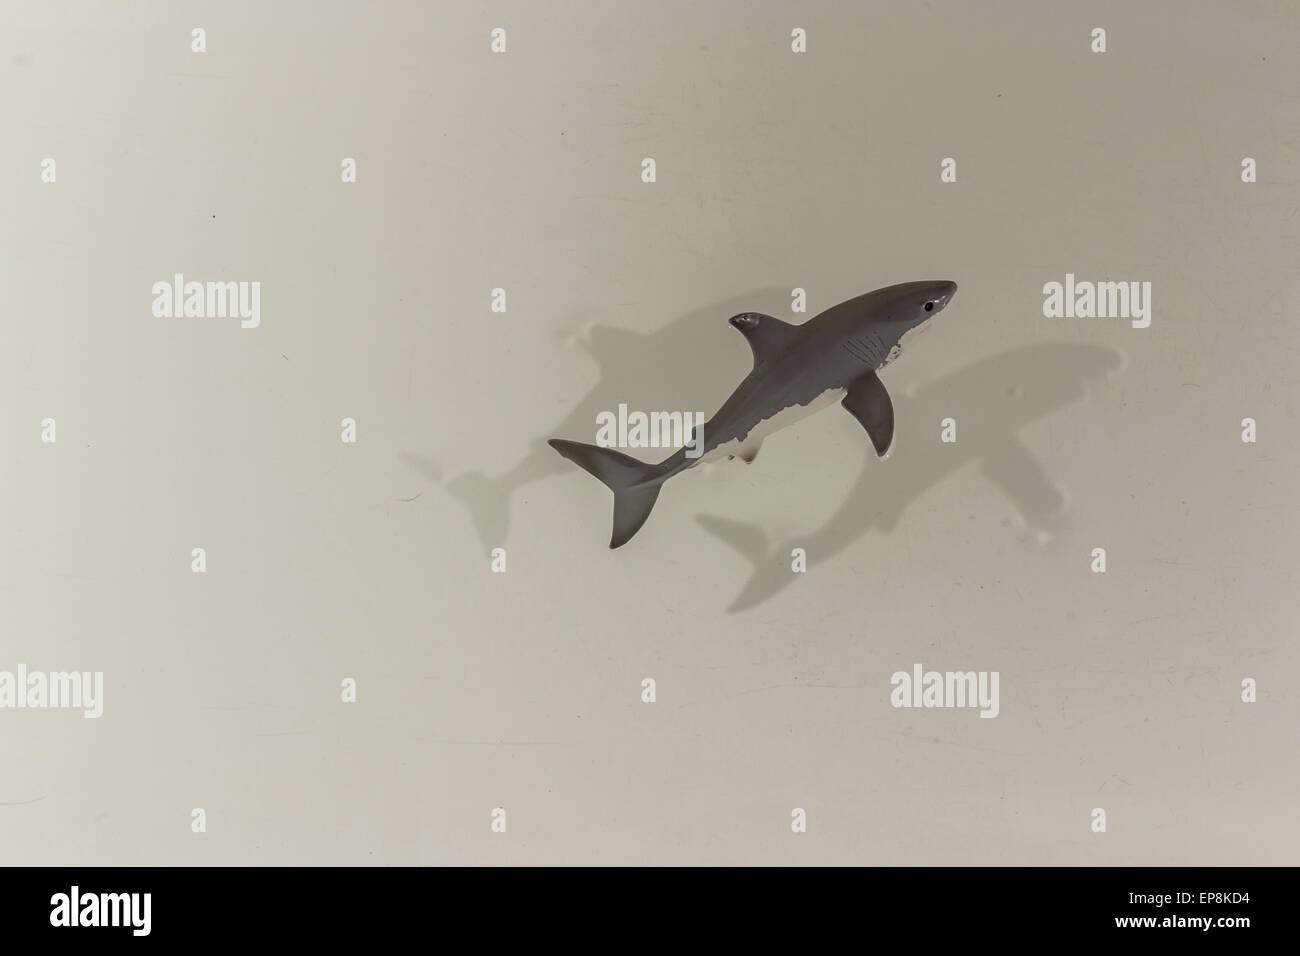 Hammerhead Shark Pos | Shark On White Background Stock Photos Shark On White Background